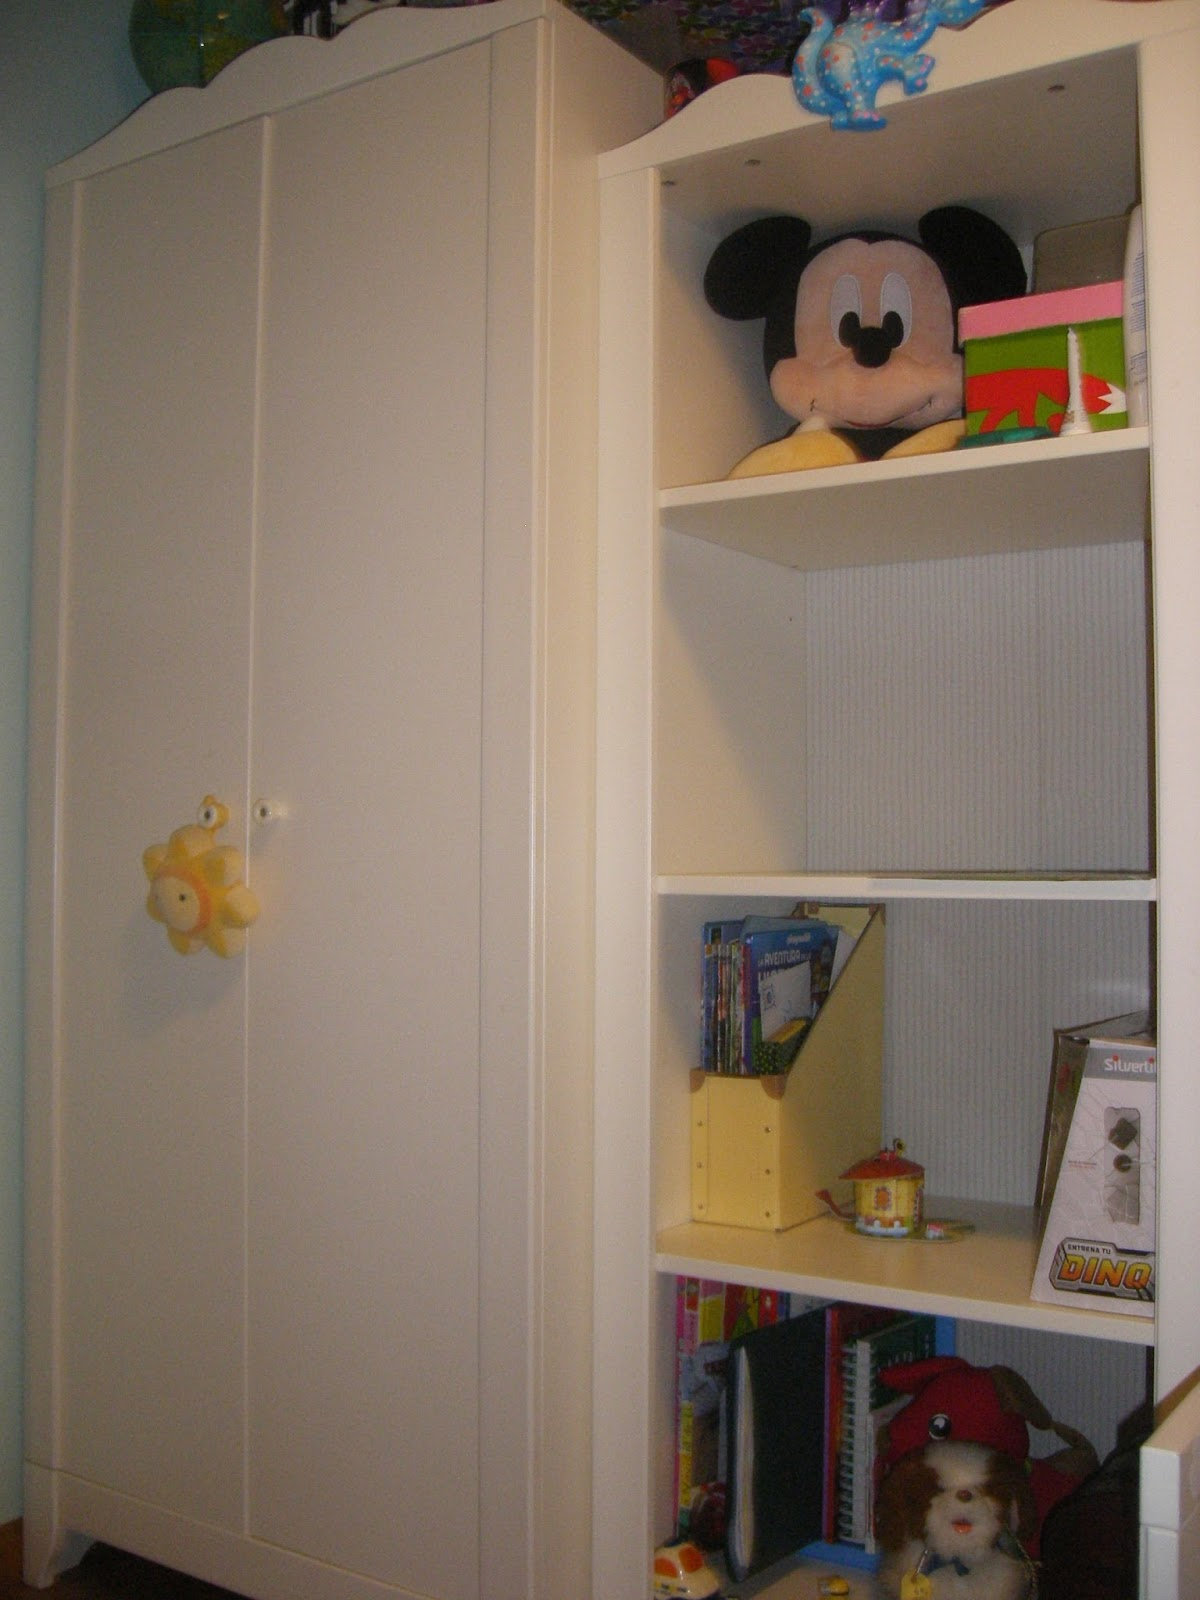 habitacion completa bebe habitaci n completa serie hensvik ikea tienda segunda mano beb e infantil ofertas en